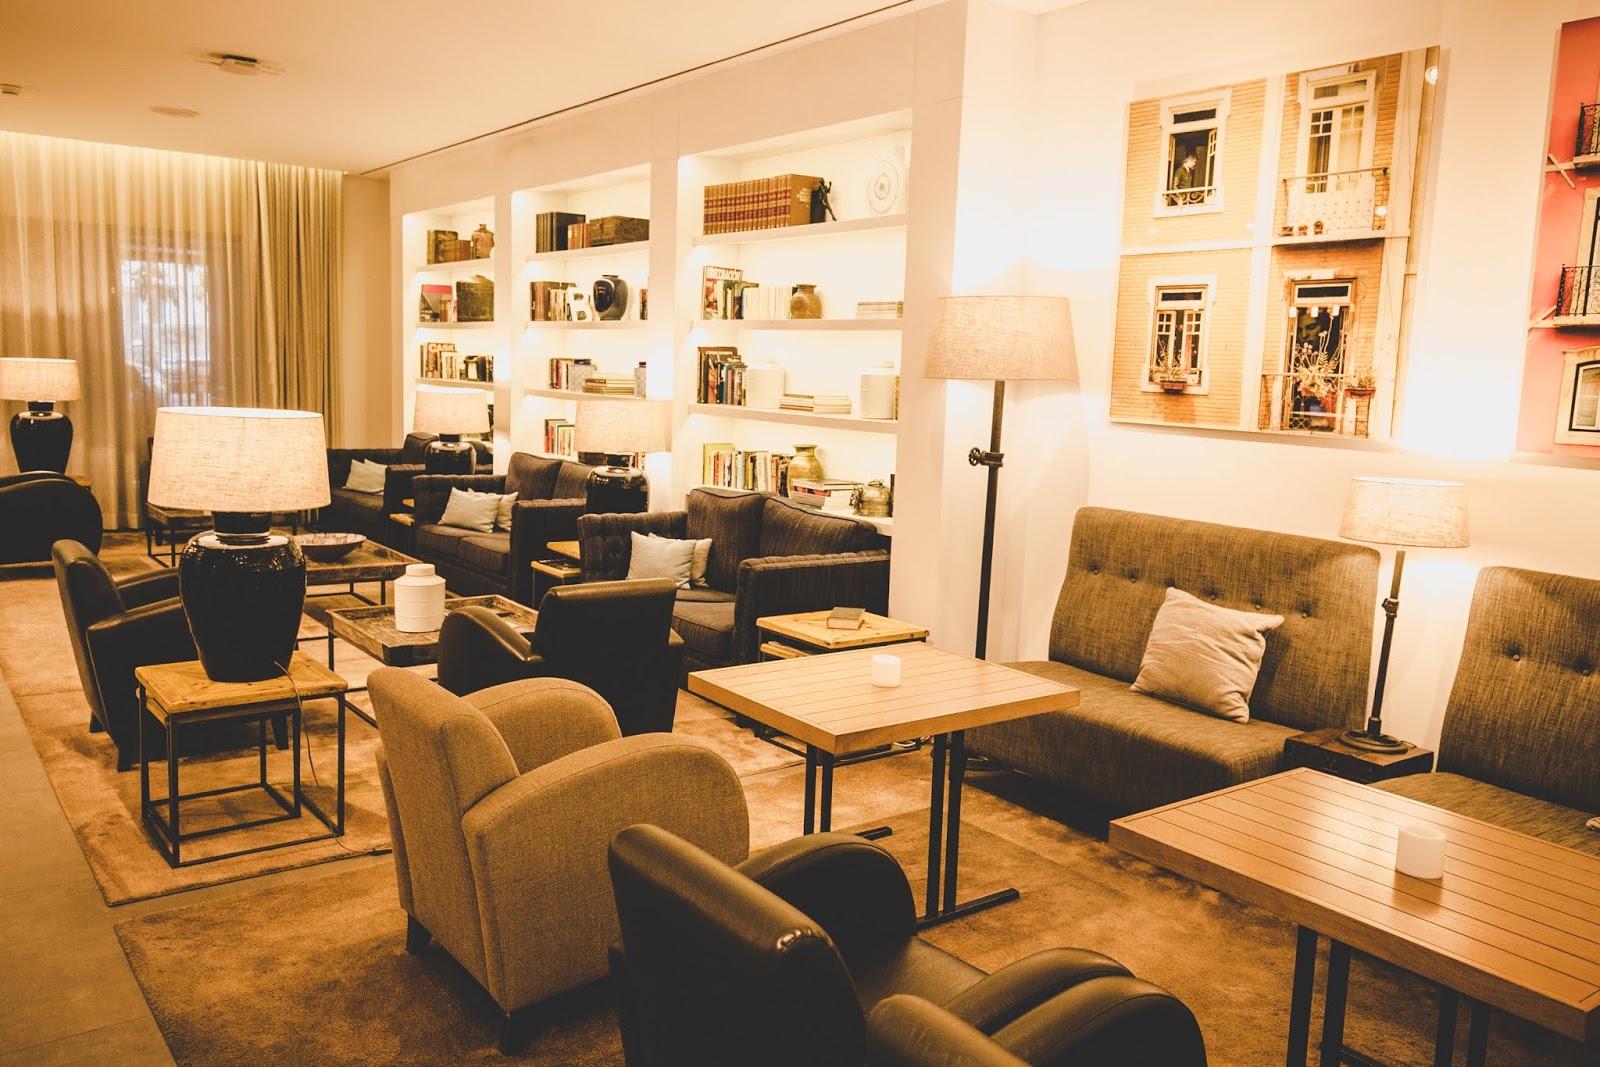 portobay marques lisbon portugal hotel review